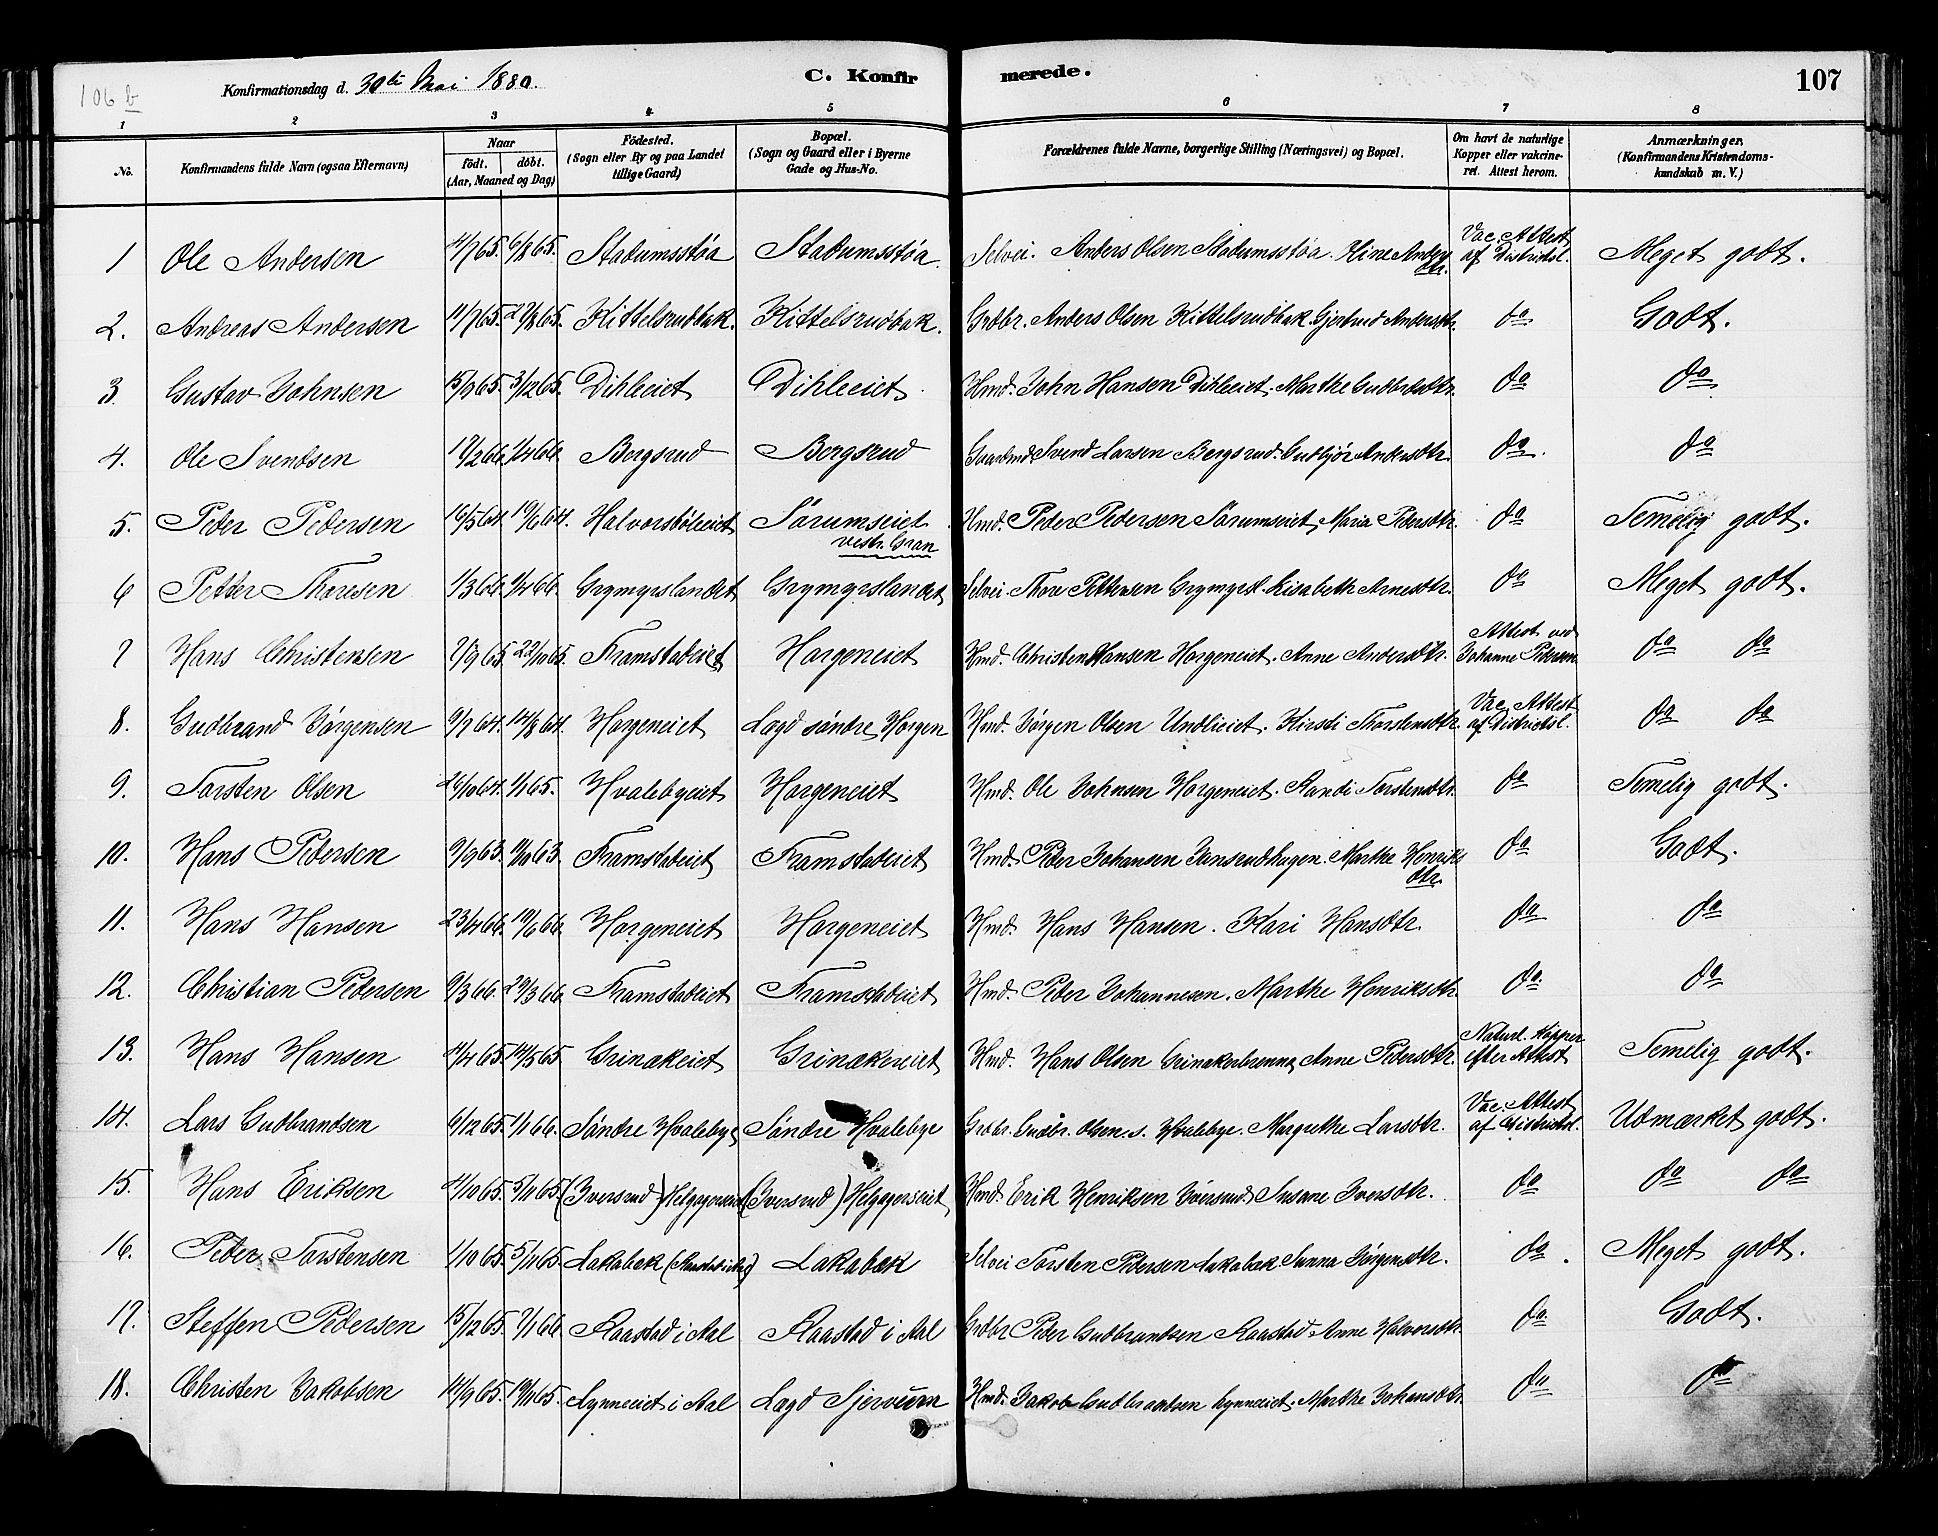 SAH, Gran prestekontor, Ministerialbok nr. 14, 1880-1889, s. 107